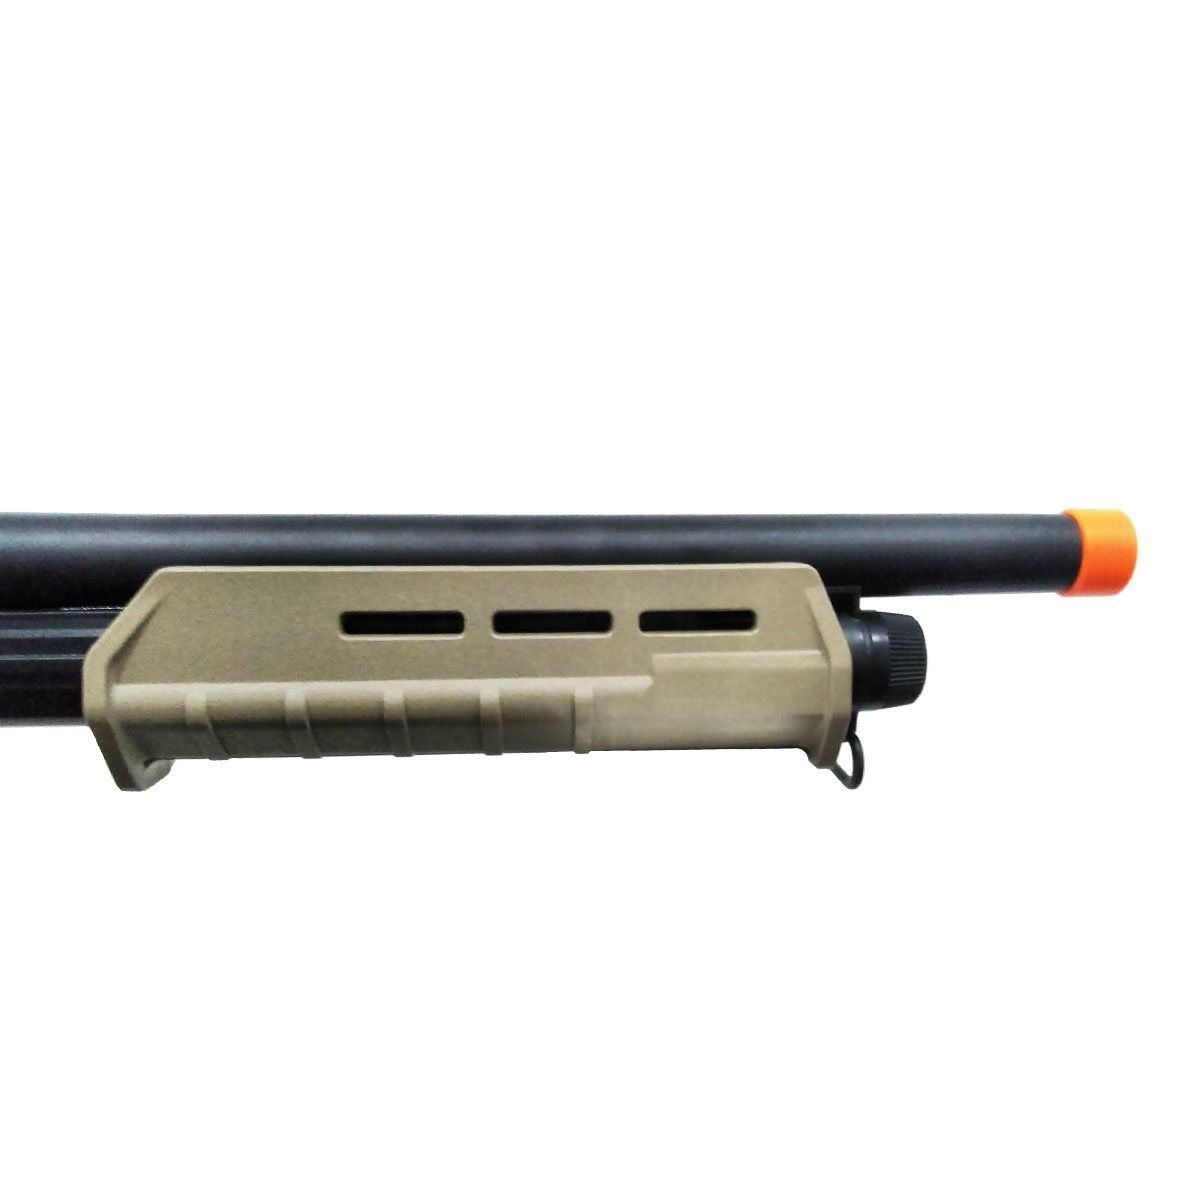 Shotgun de Airsoft Spring CYMA CM355 Trishot Curta - Tan